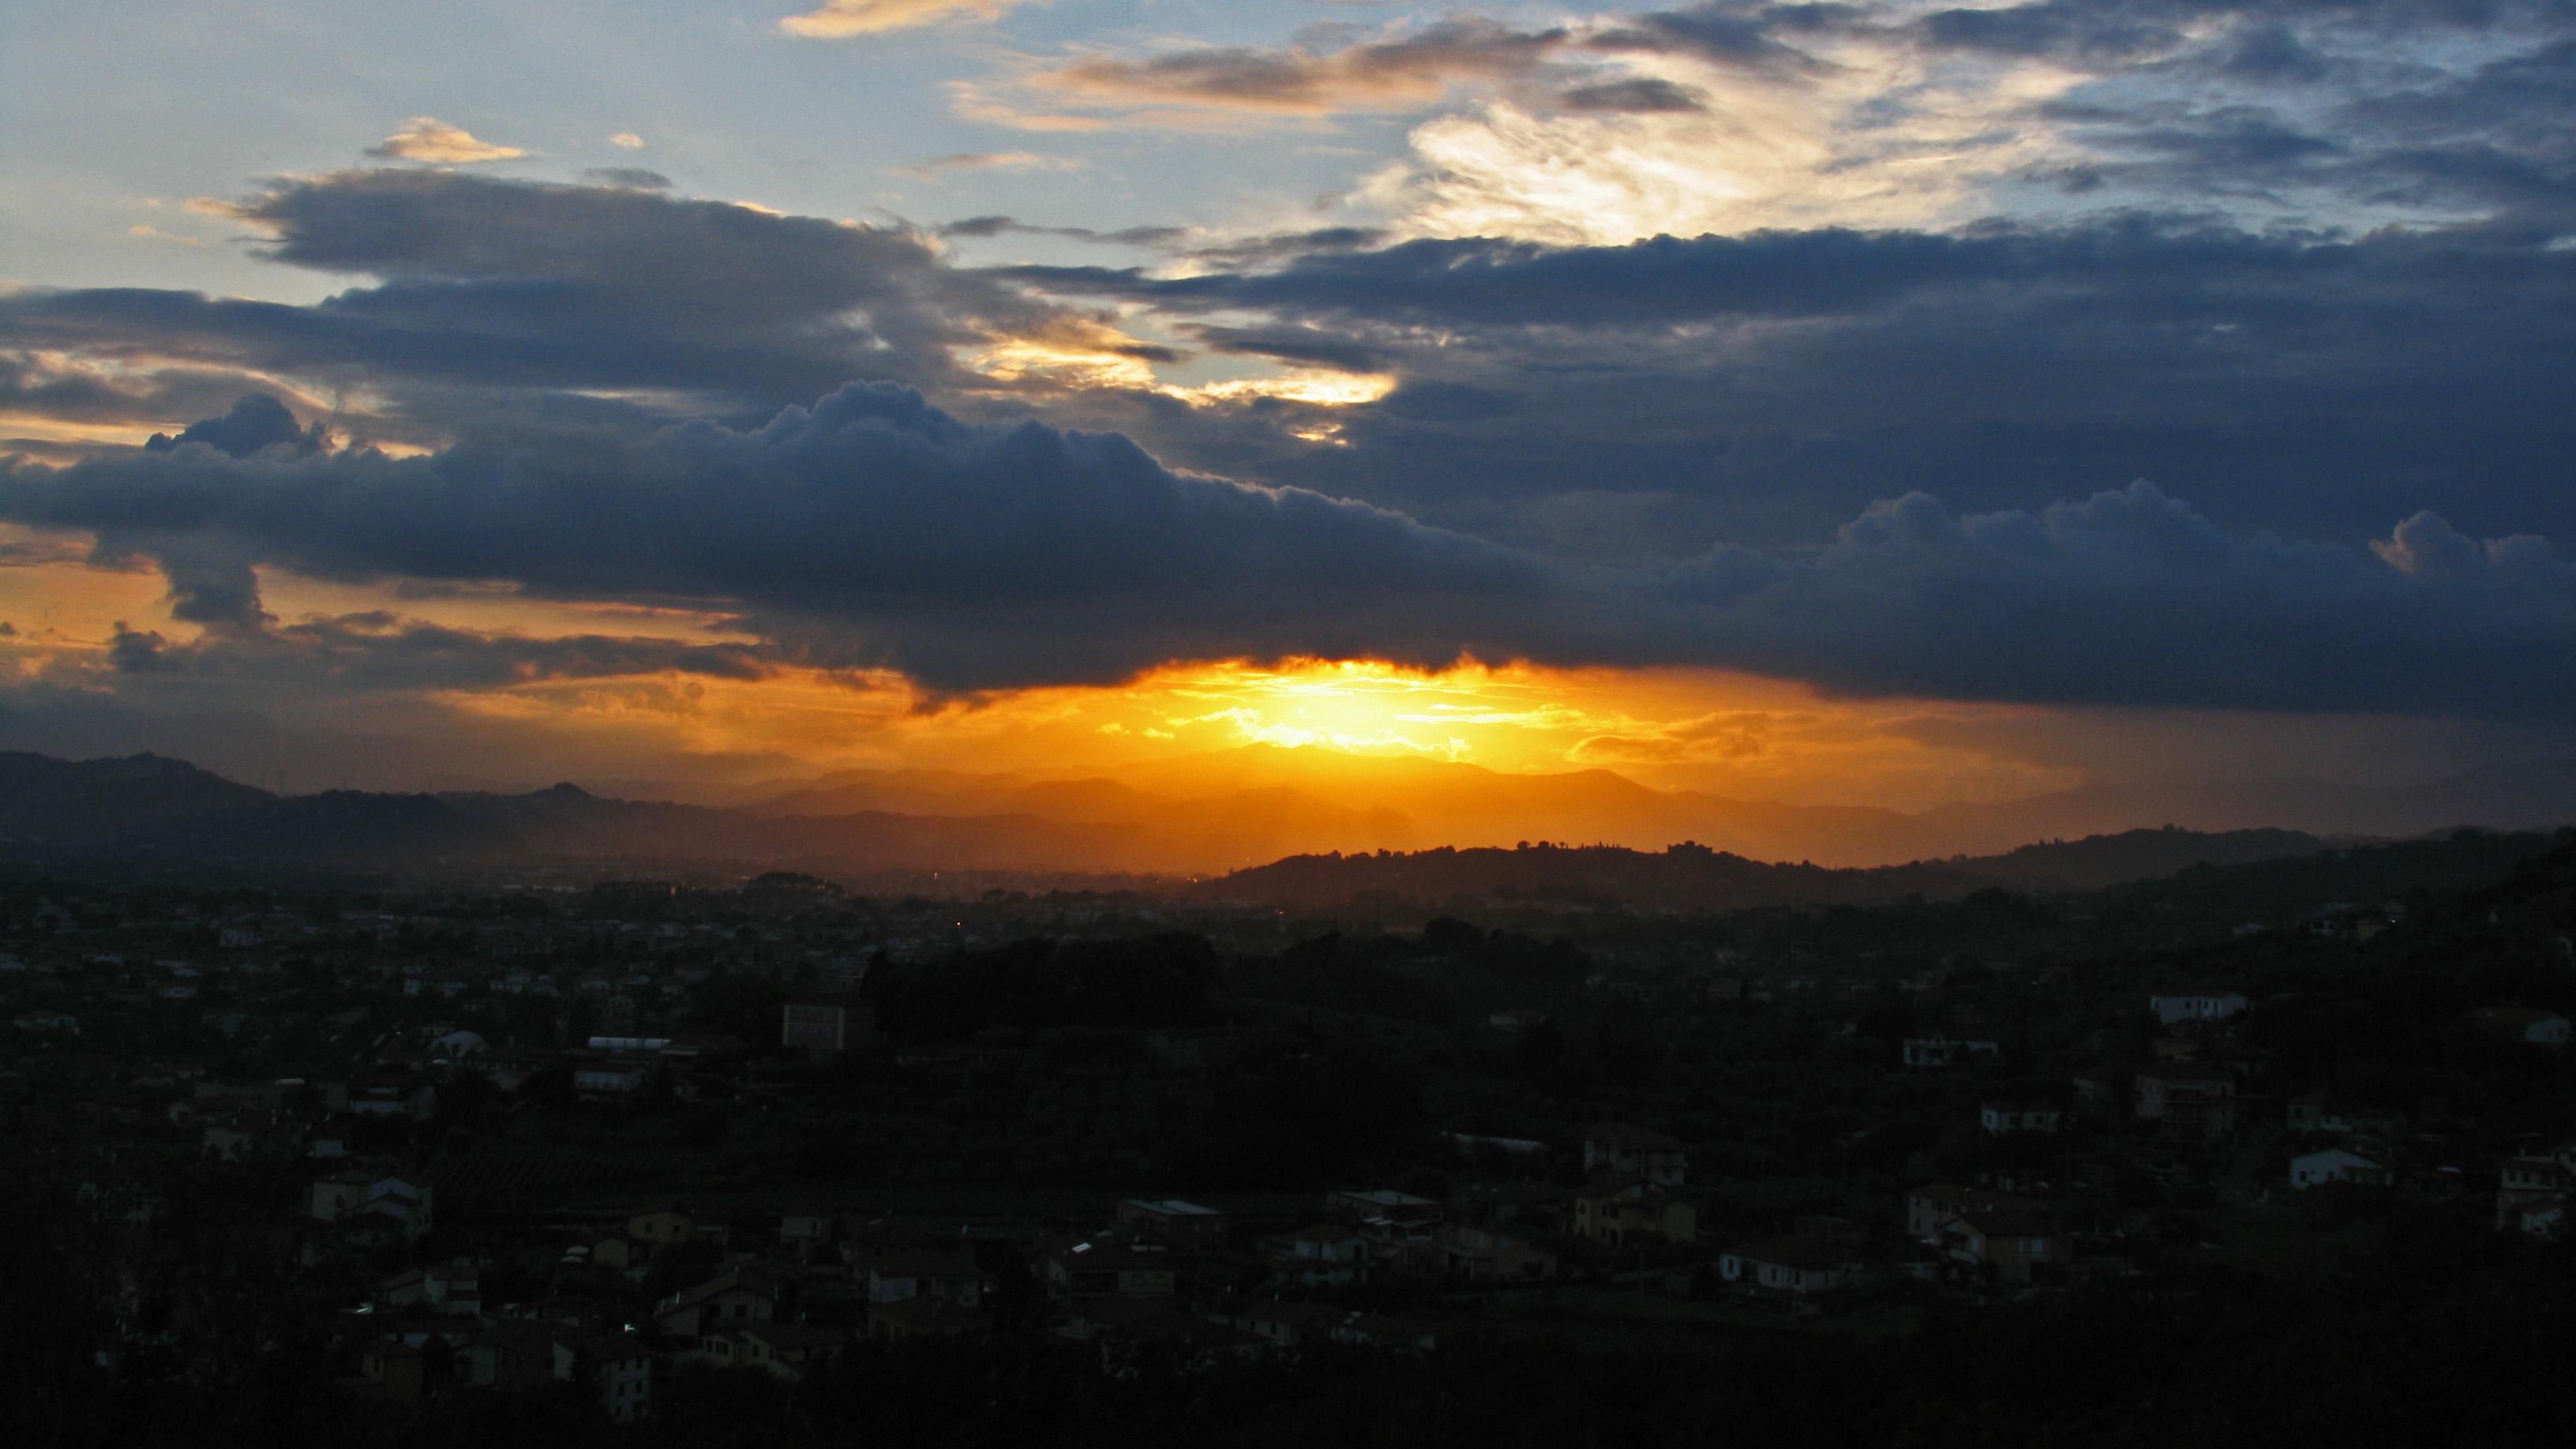 Ippotur sunset